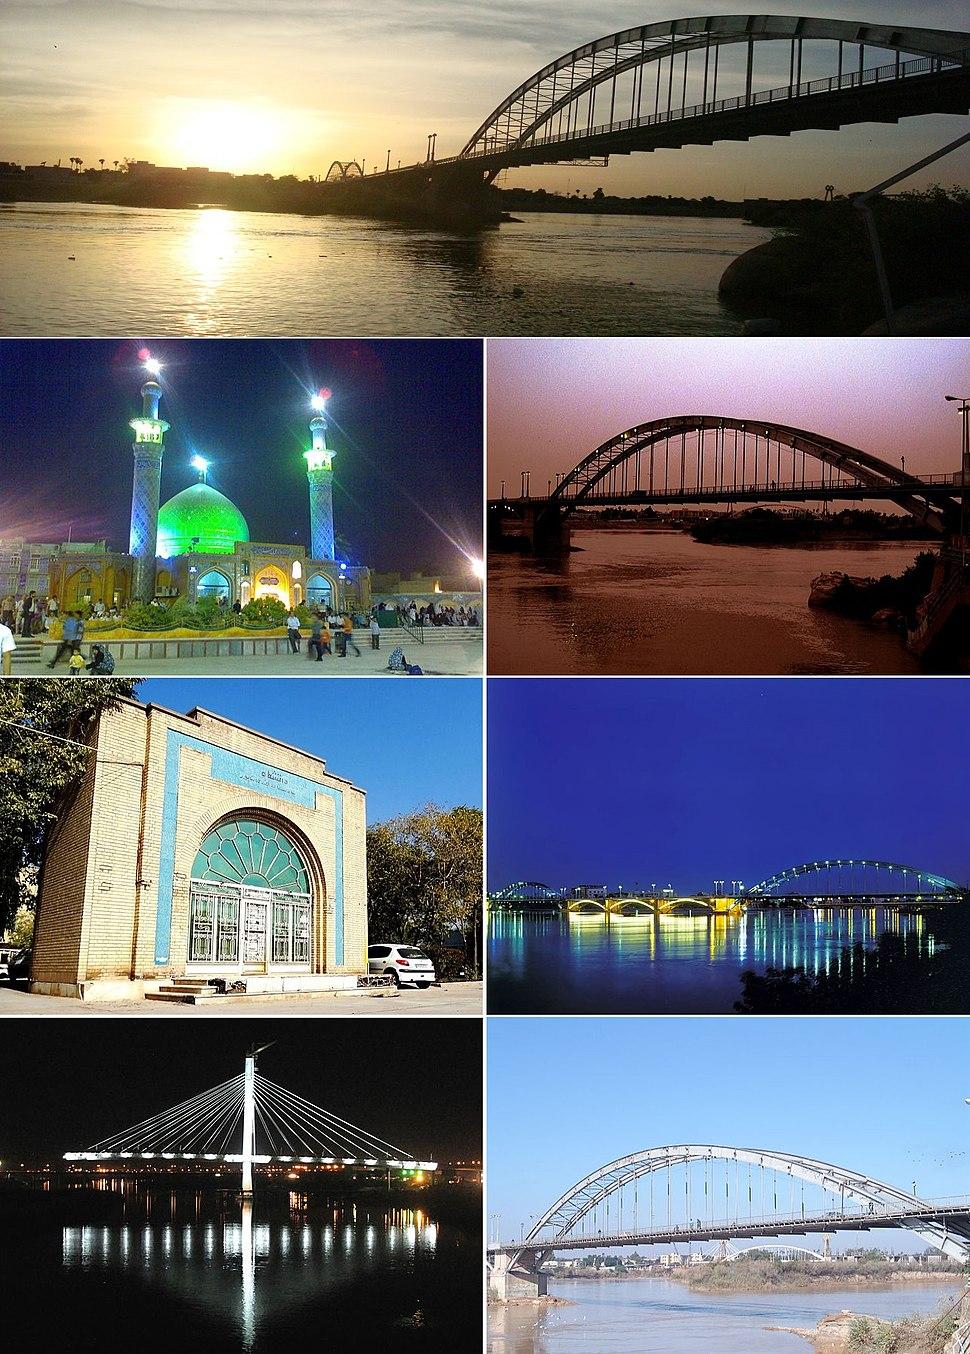 Clockwise from top: White Bridge, Twilight view of White Bridge over Karoon River, Ahvaz Bridge over Karun River at night, Pol Sefid, Pol Hashtom, Jundishapur Medical Center and Masjid Ali Mahziar